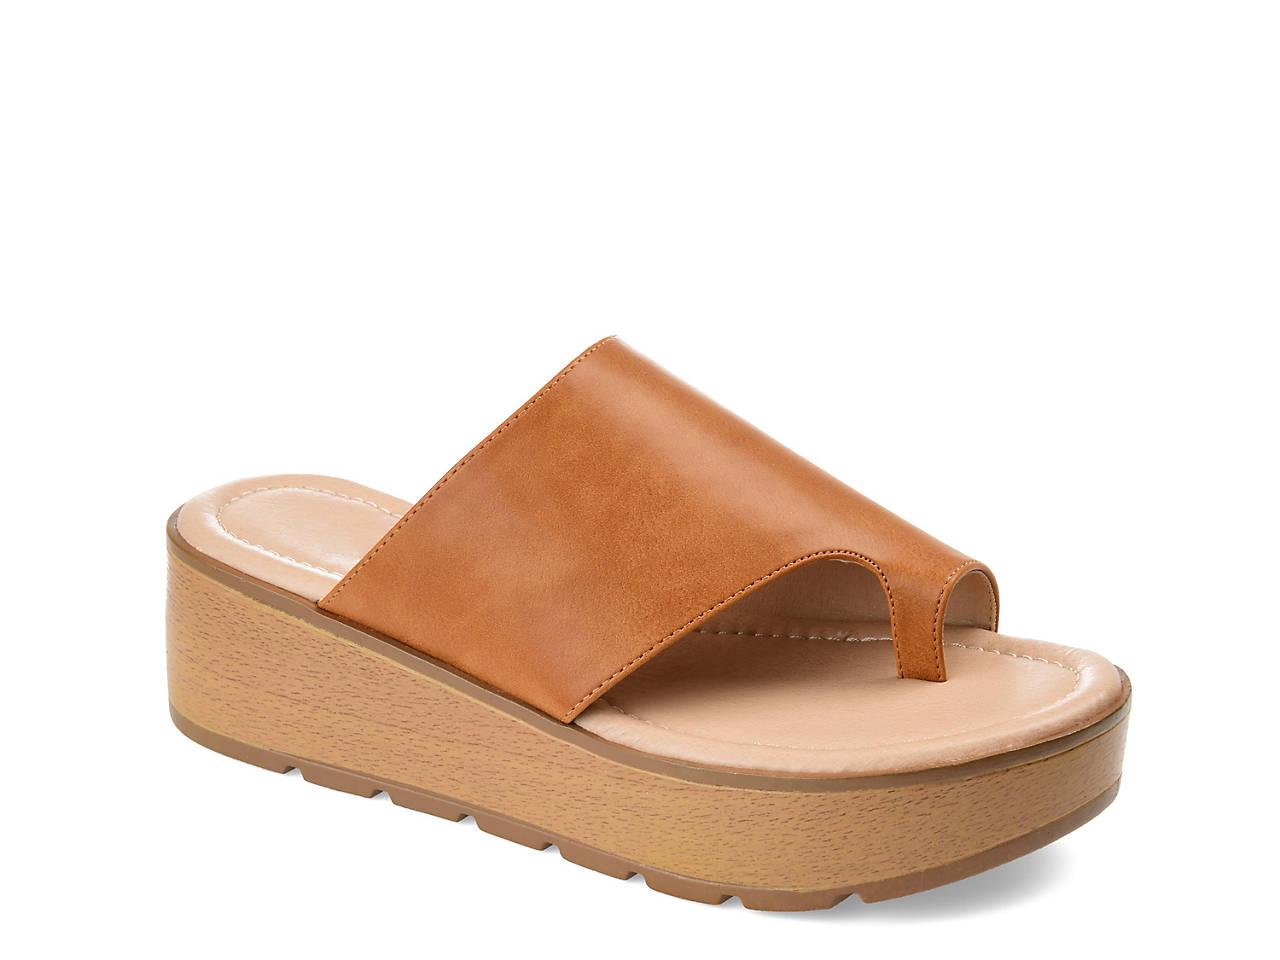 b04dda156def Journee Collection Arabel Wedge Sandal Women s Shoes